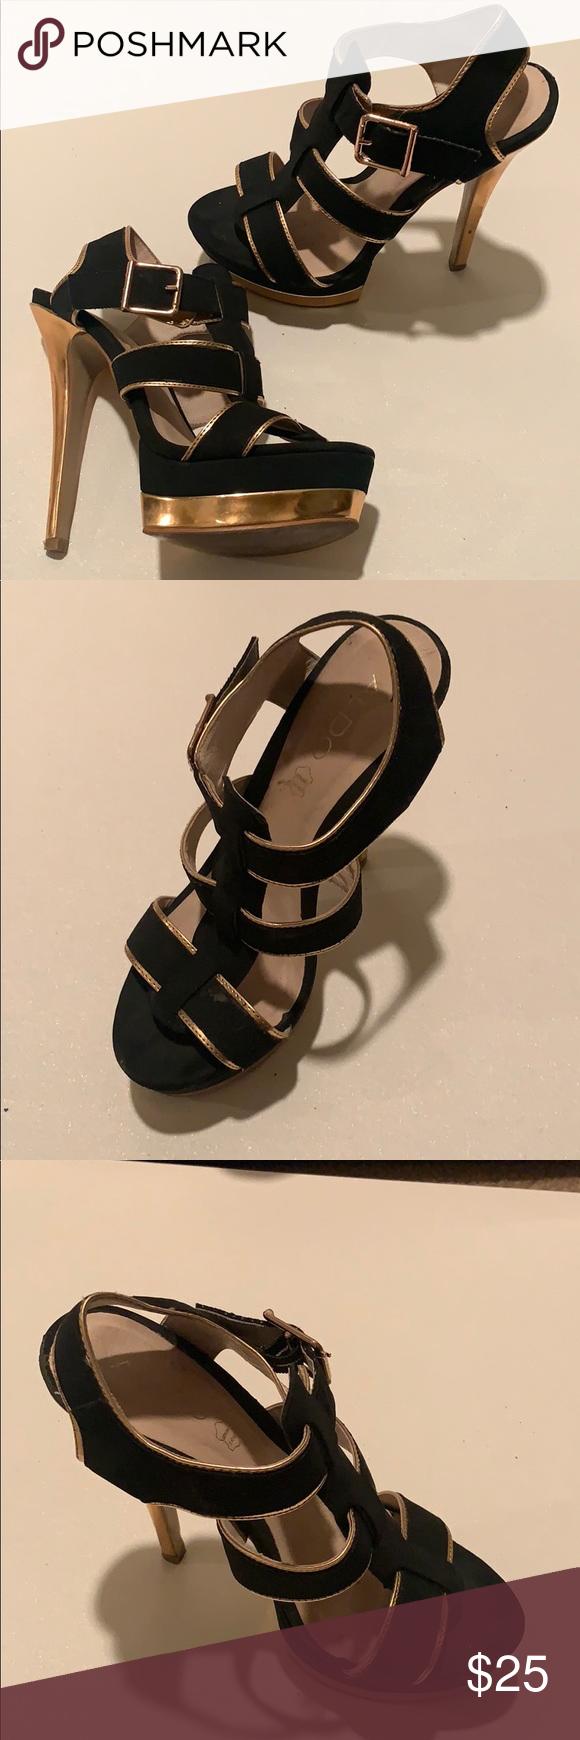 277873060bd ALDO Black and Rose Gold Strappy Platform Heels ALDO strappy heeled ...